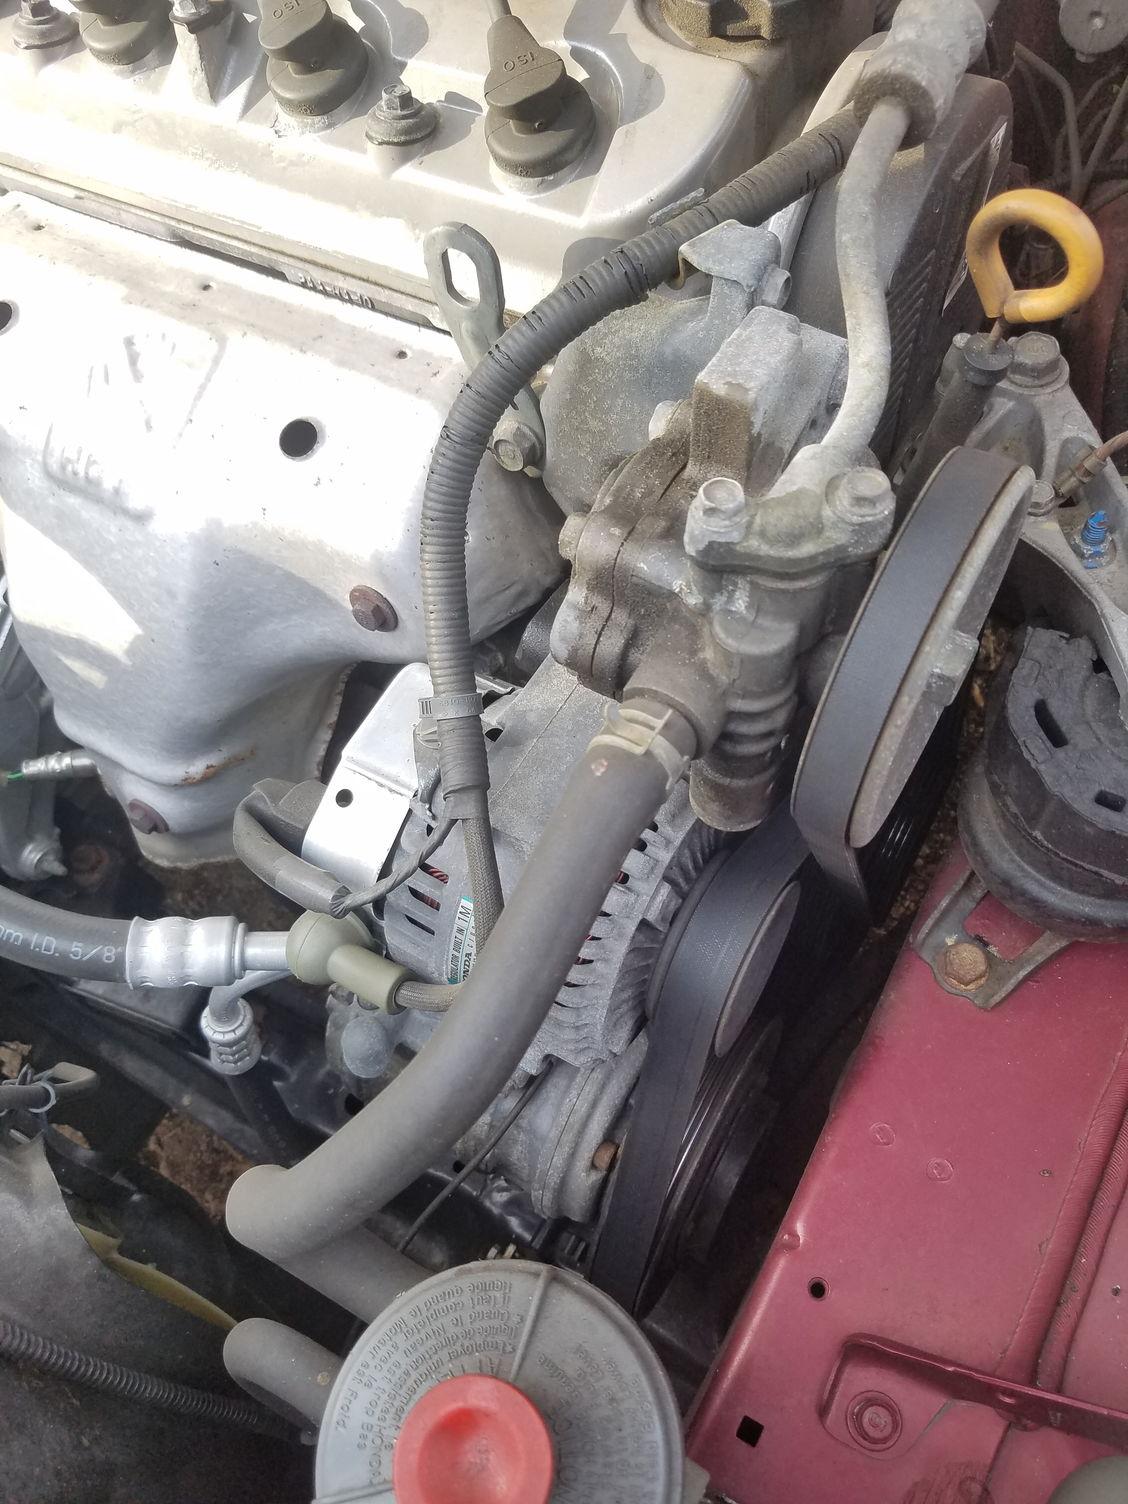 Ed F Accbc Bbe C Ef C A Ac on 2000 Honda Accord Distributor Oil Leak